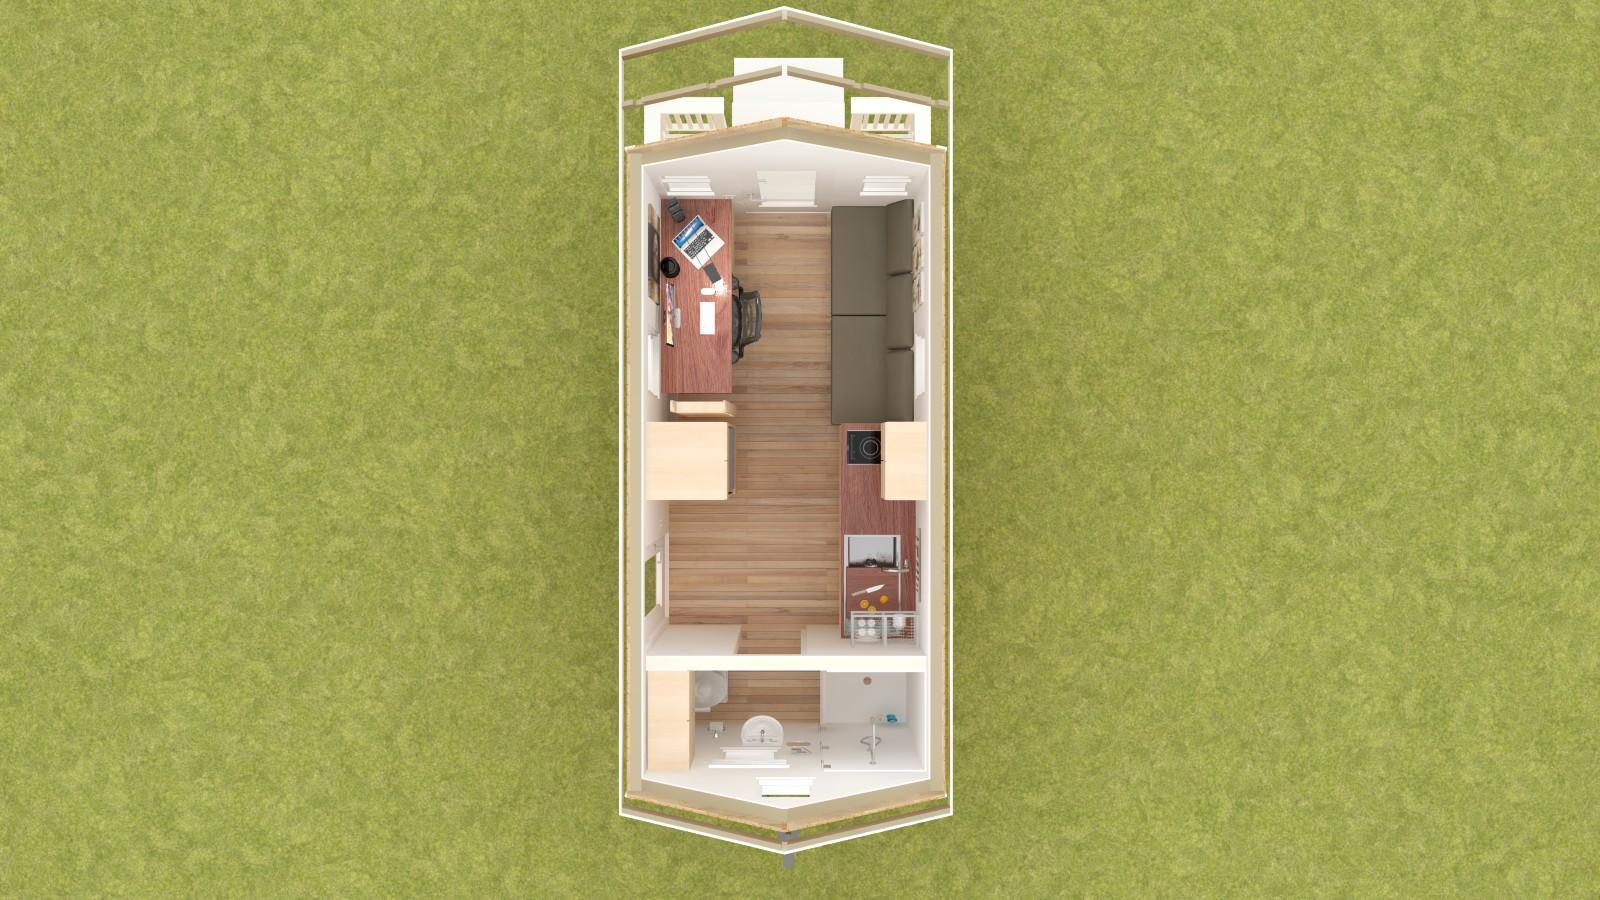 Calpella 18 Tiny House Floor Plan Lower Level